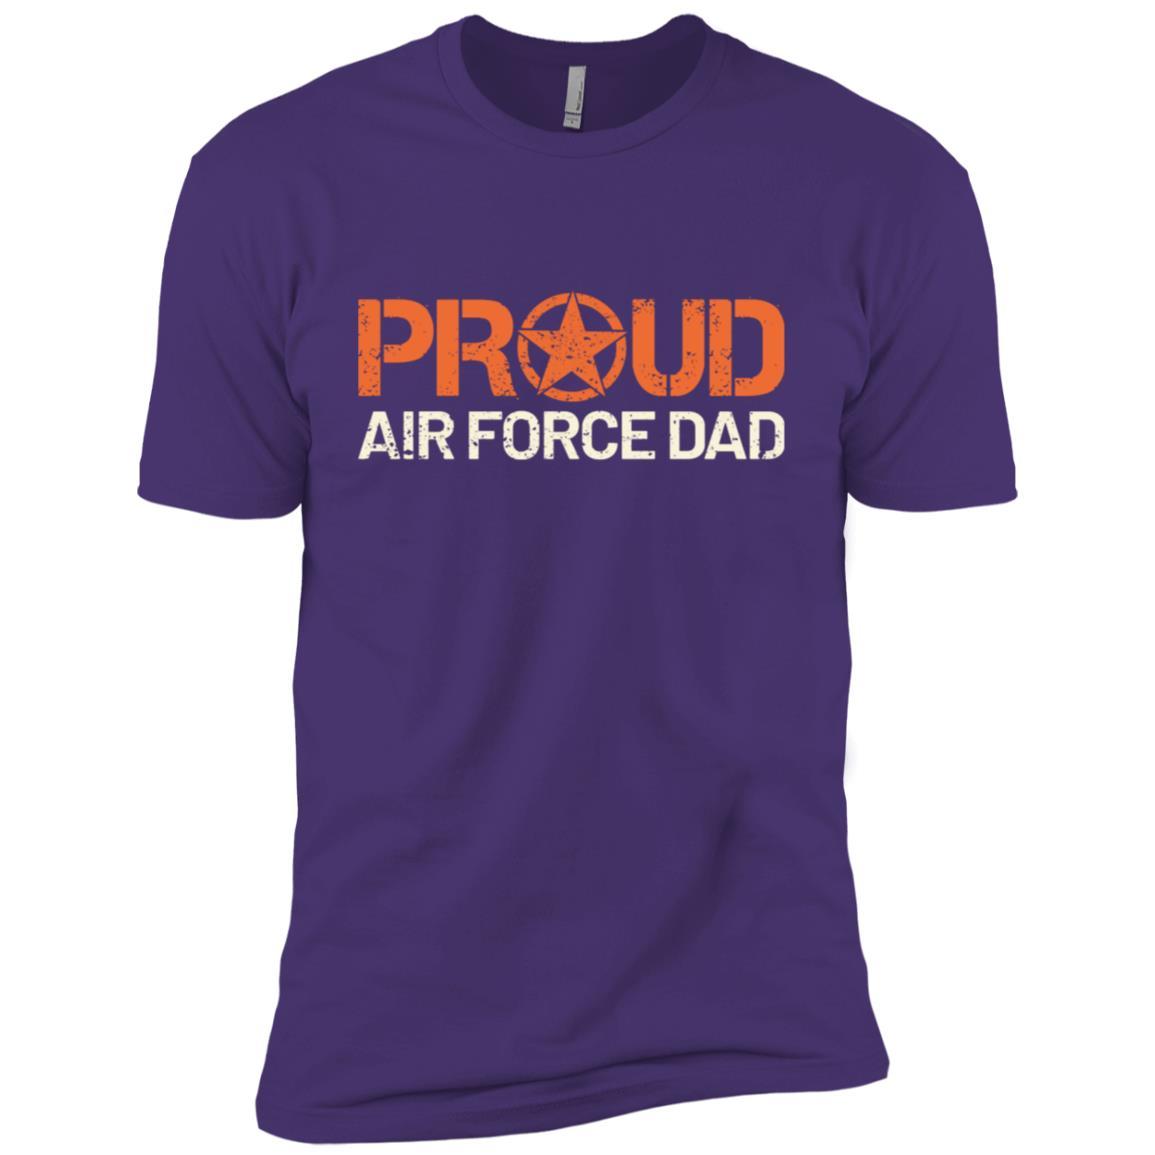 Proud Air Force Dad – Men's Airman's Father Tee Men Short Sleeve T-Shirt